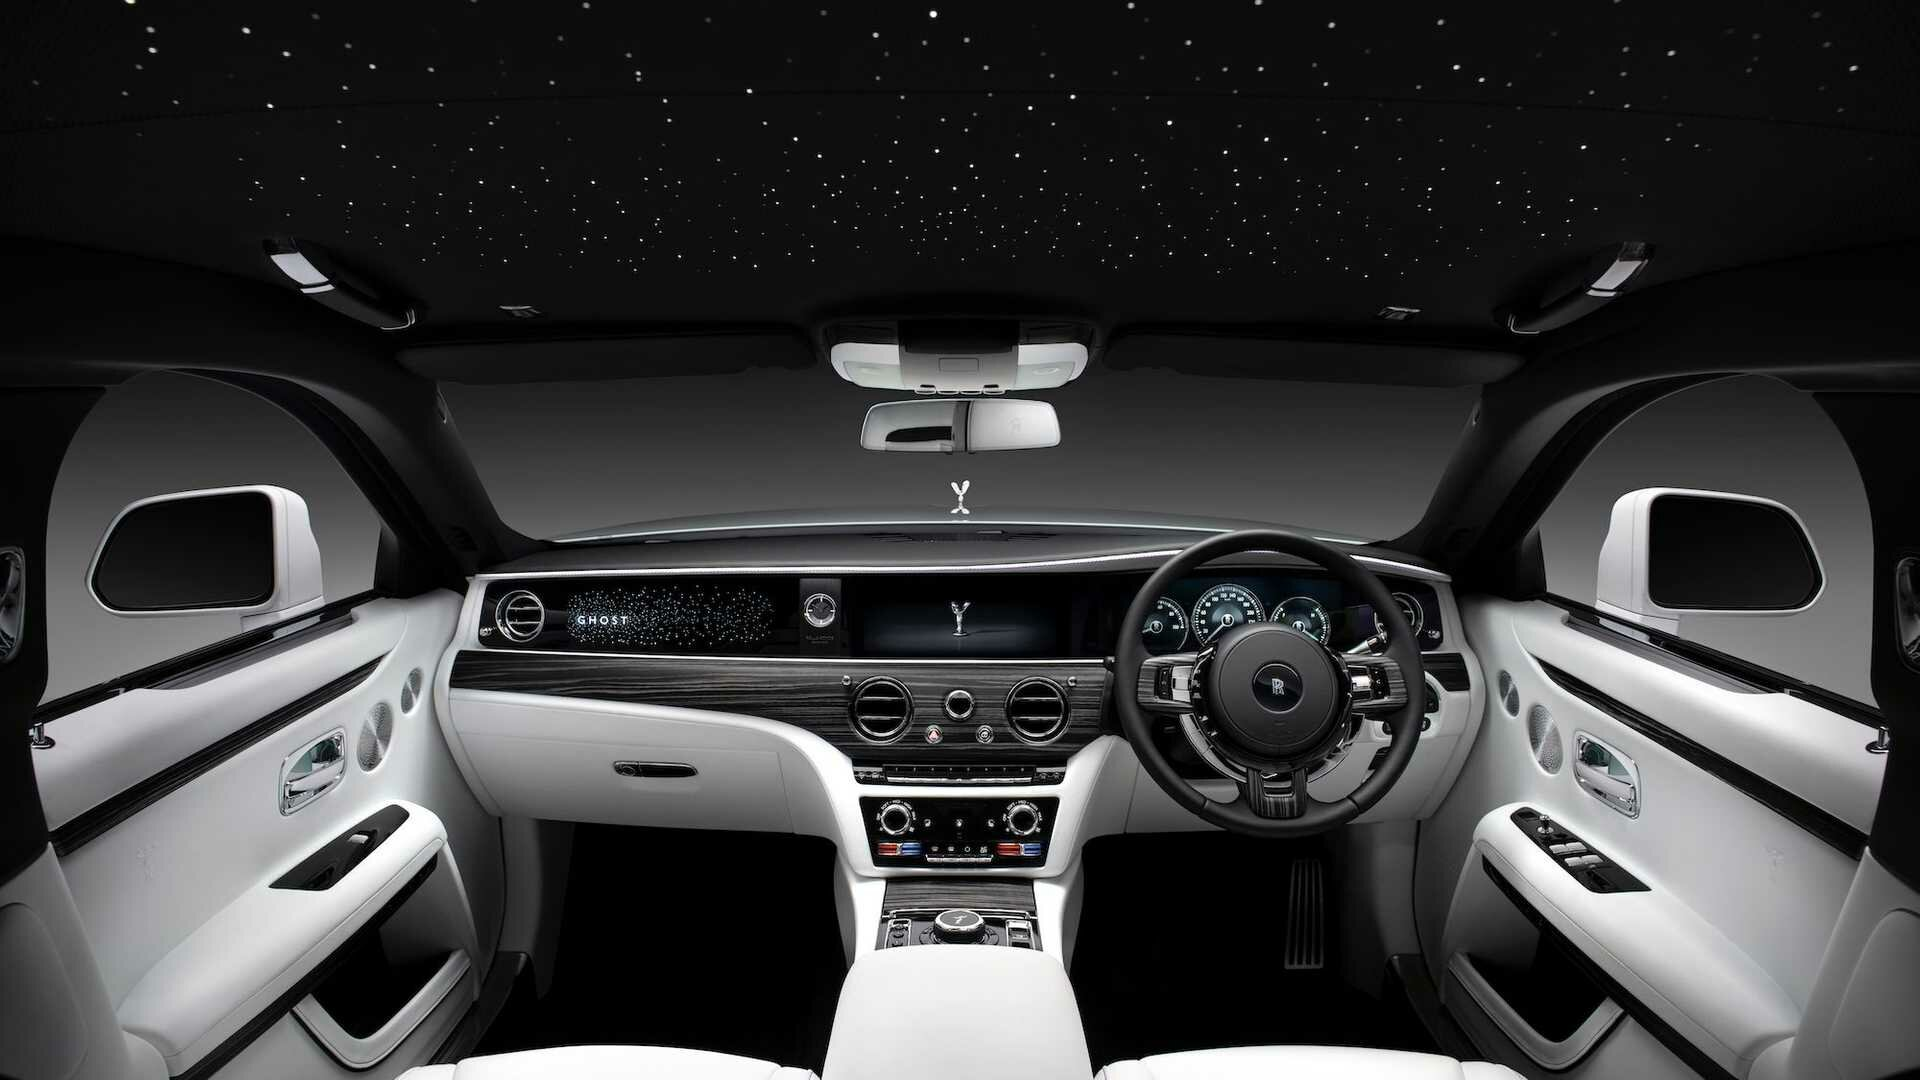 2021-rolls-royce-ghost-interior6.jpg